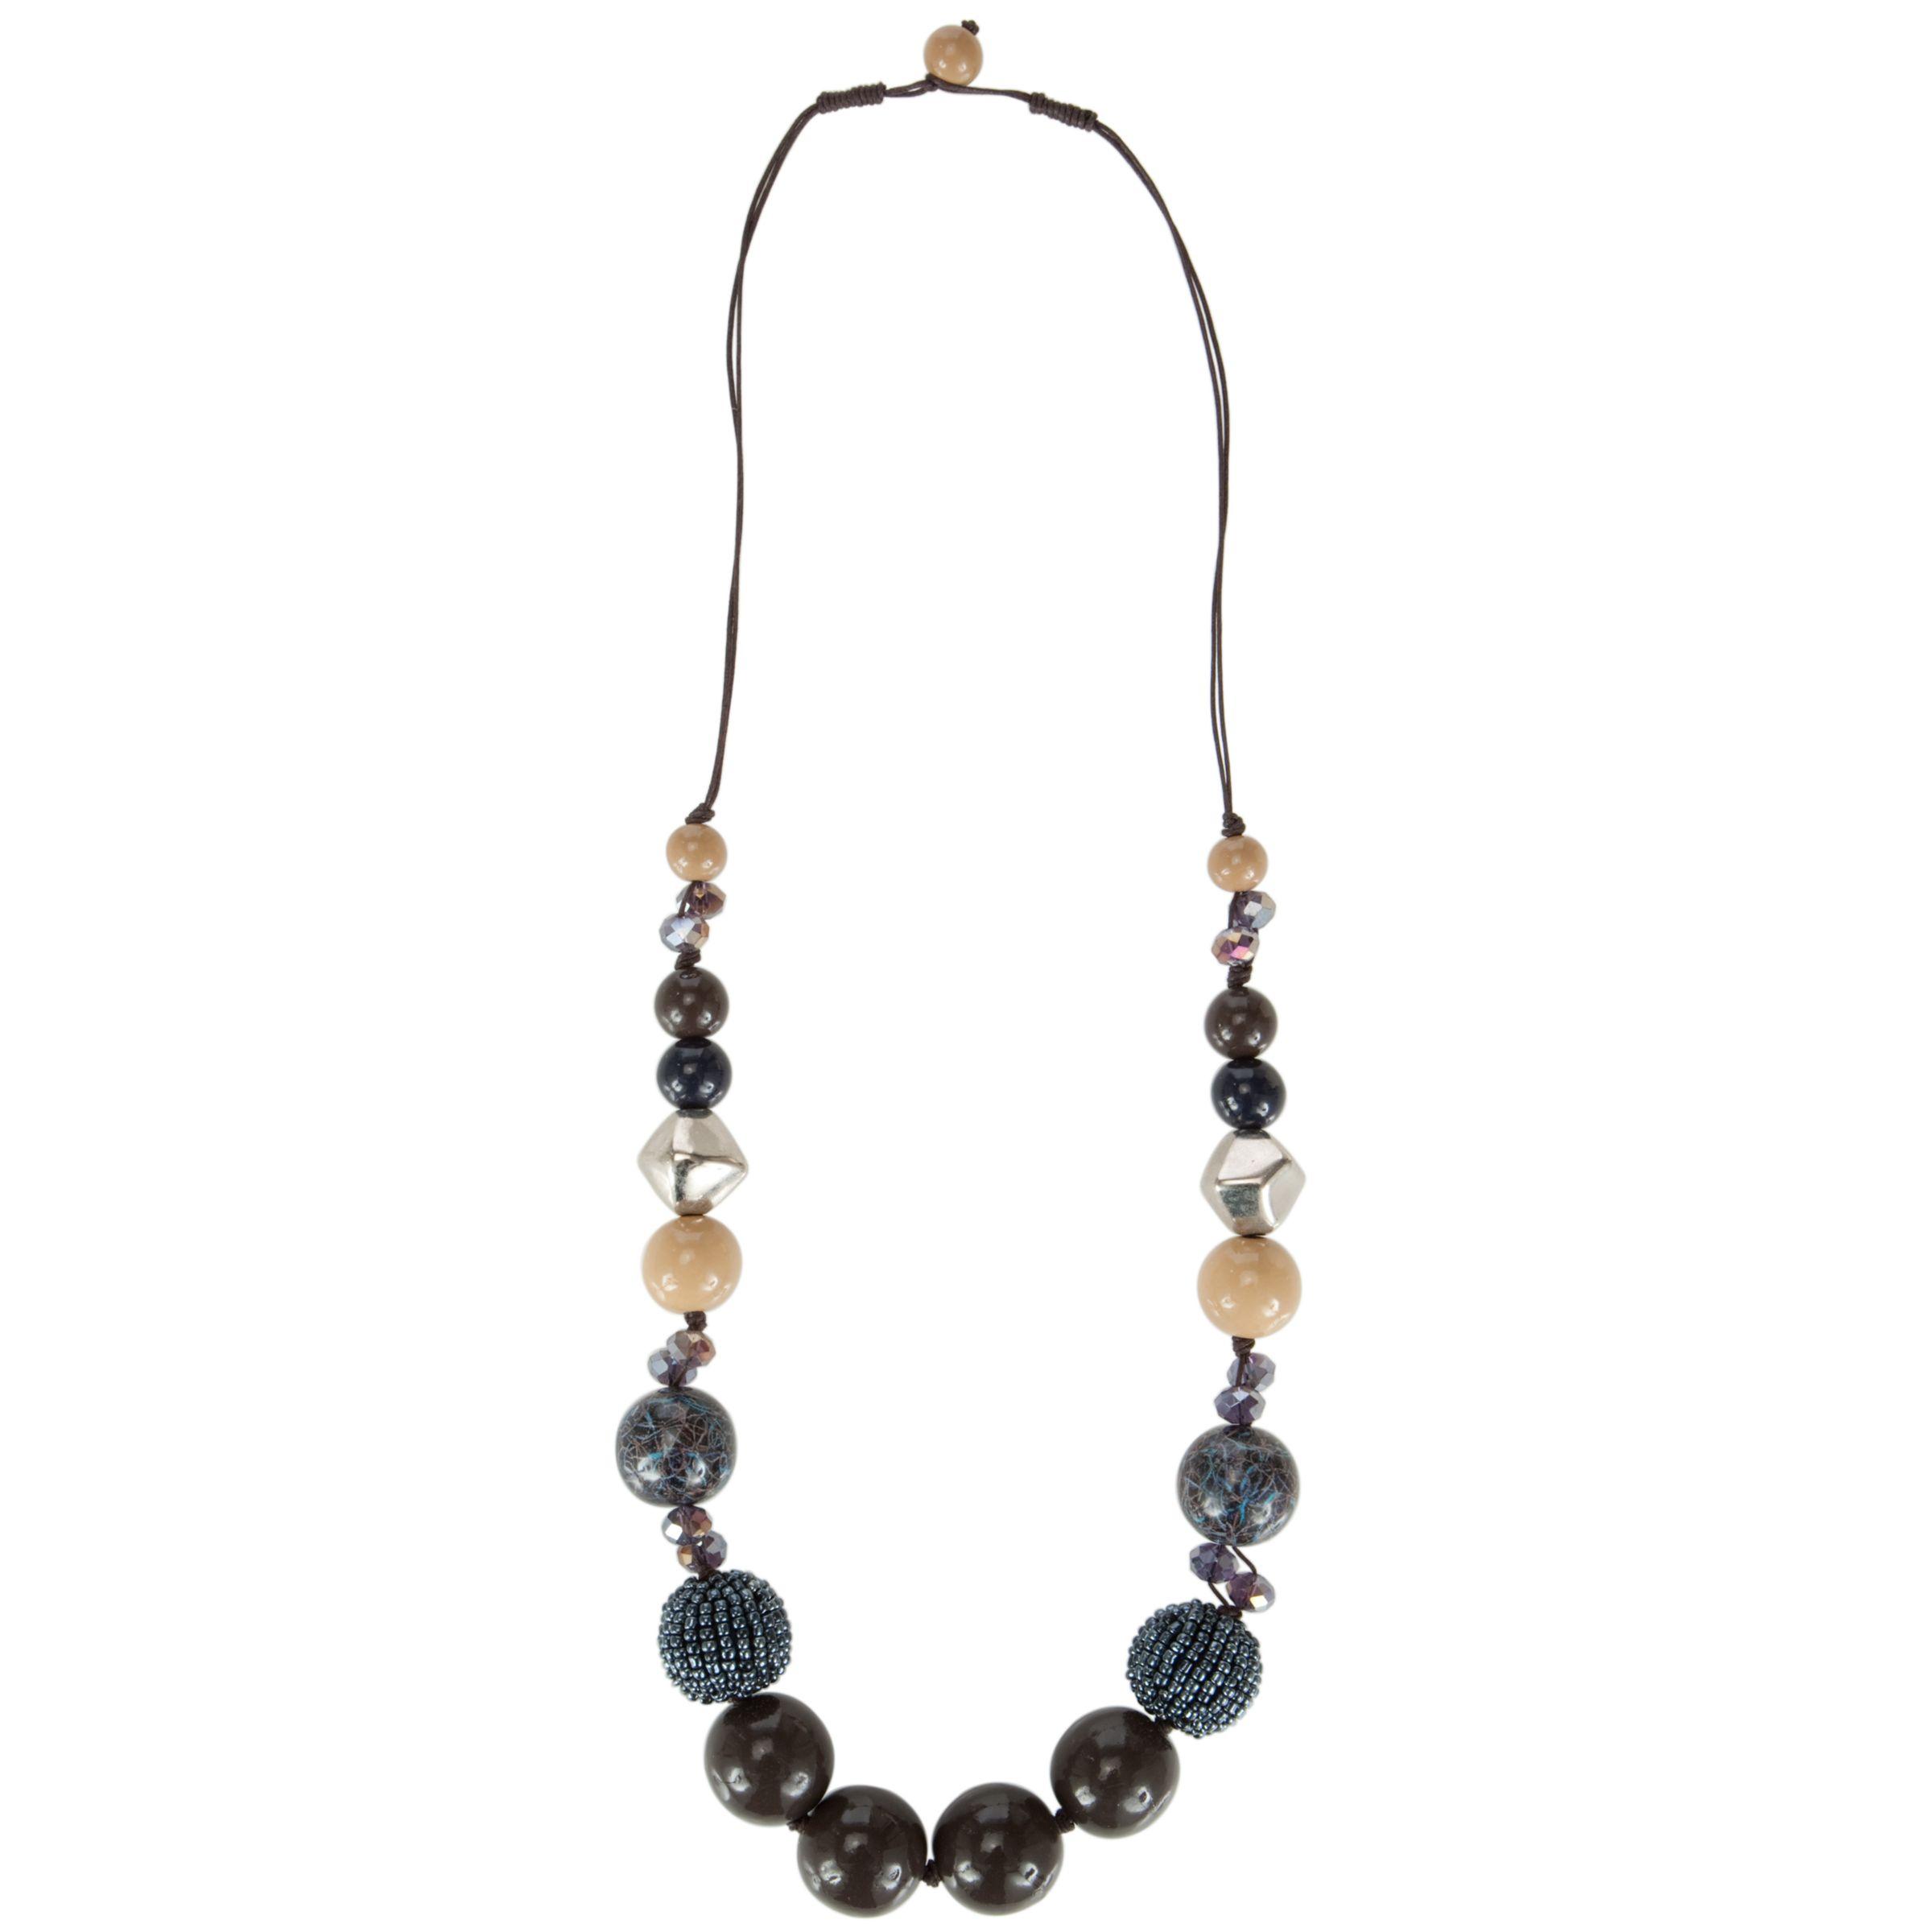 John Lewis Women Multicoloured Bead Long Necklace, Blue/Cream/Navy